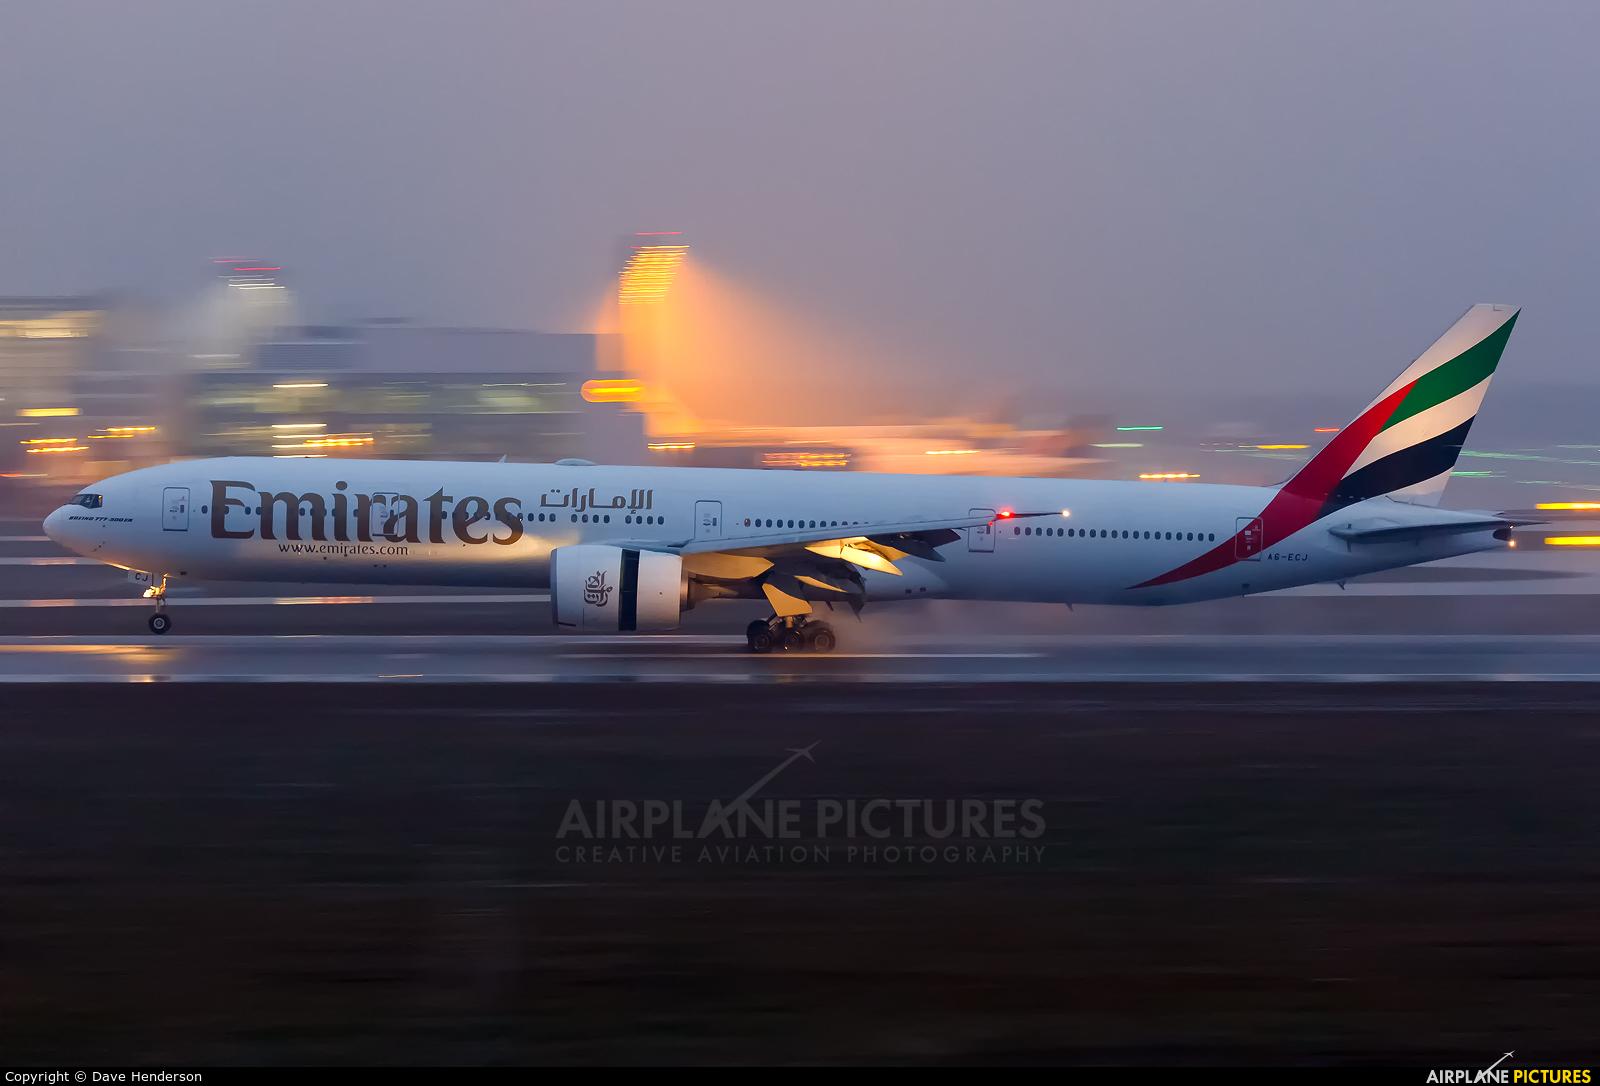 Emirates Airlines A6-ECJ aircraft at Munich